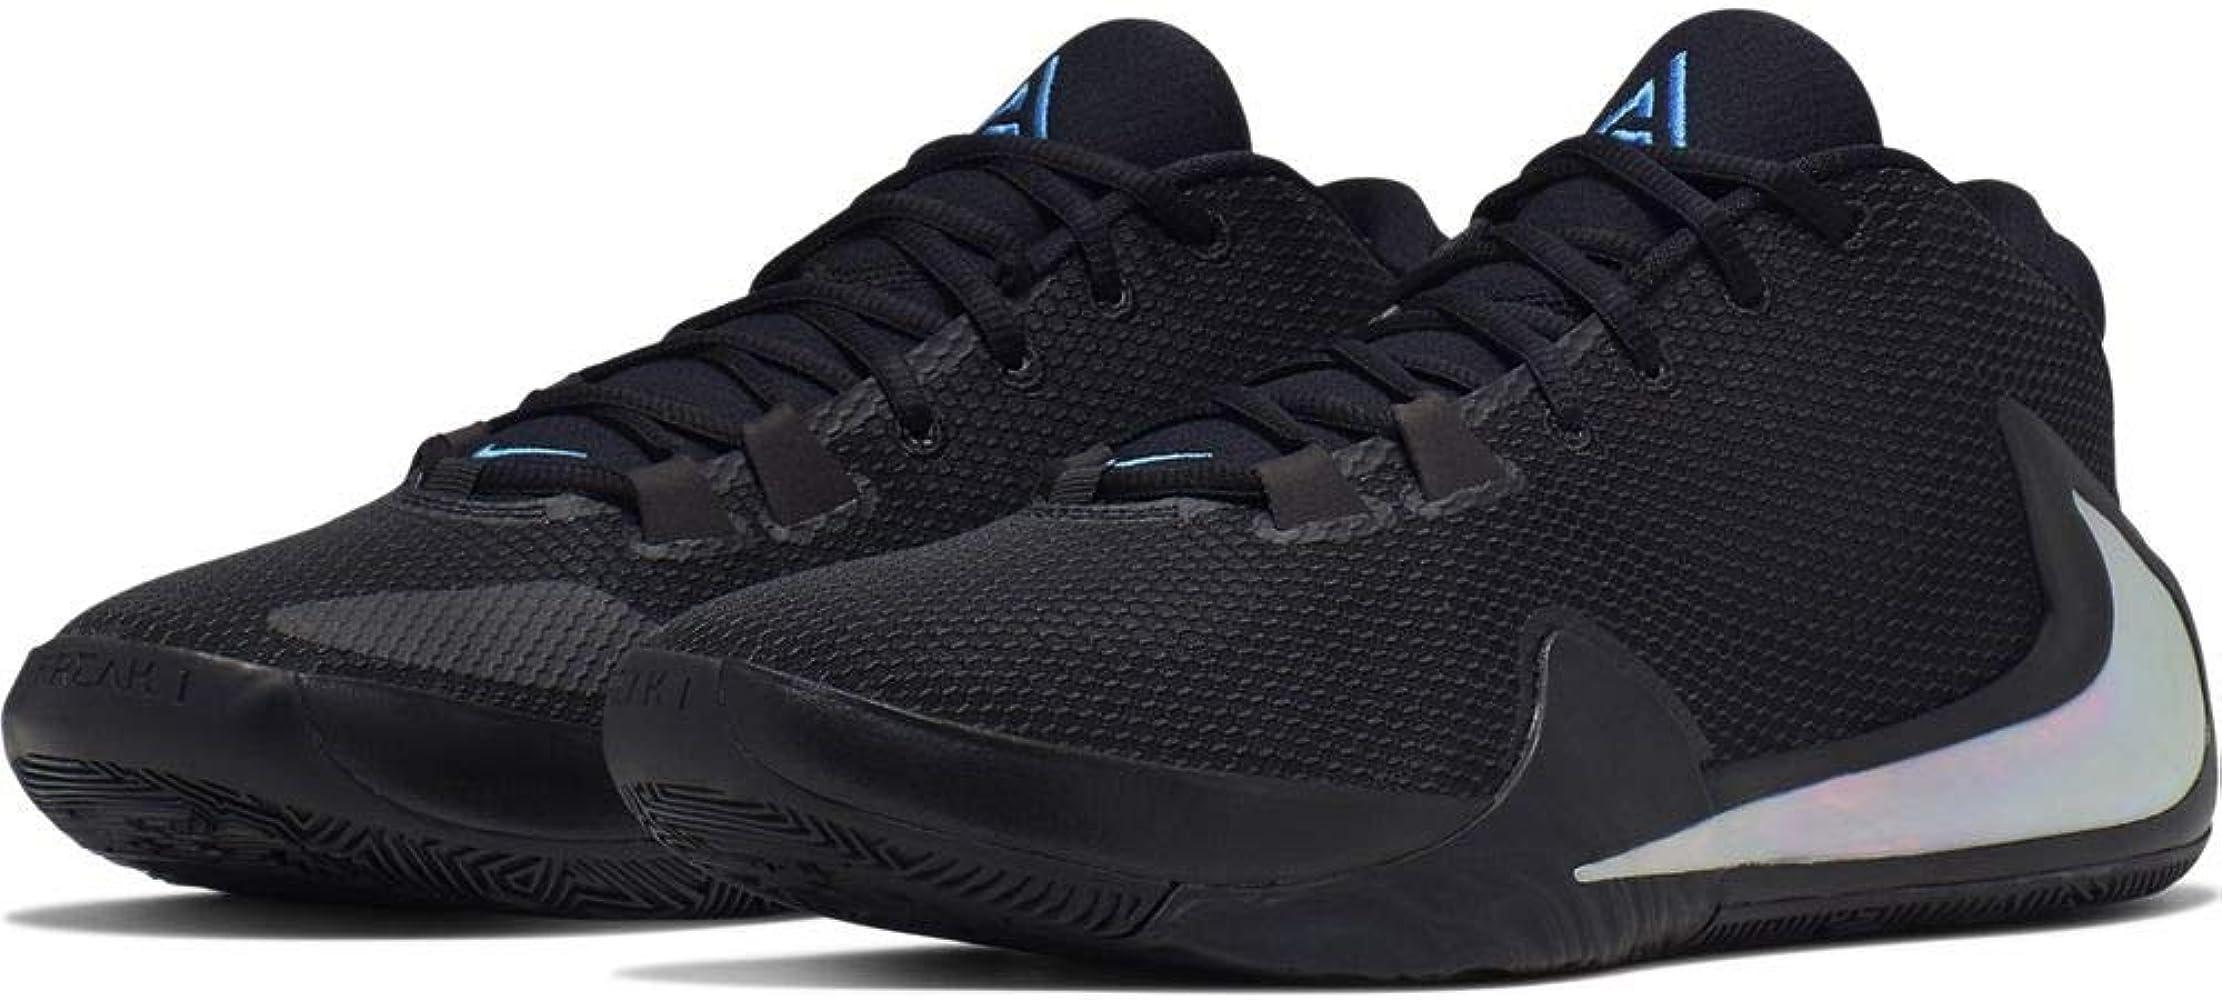 Zoom Freak 1 Basketball Shoes (8.5